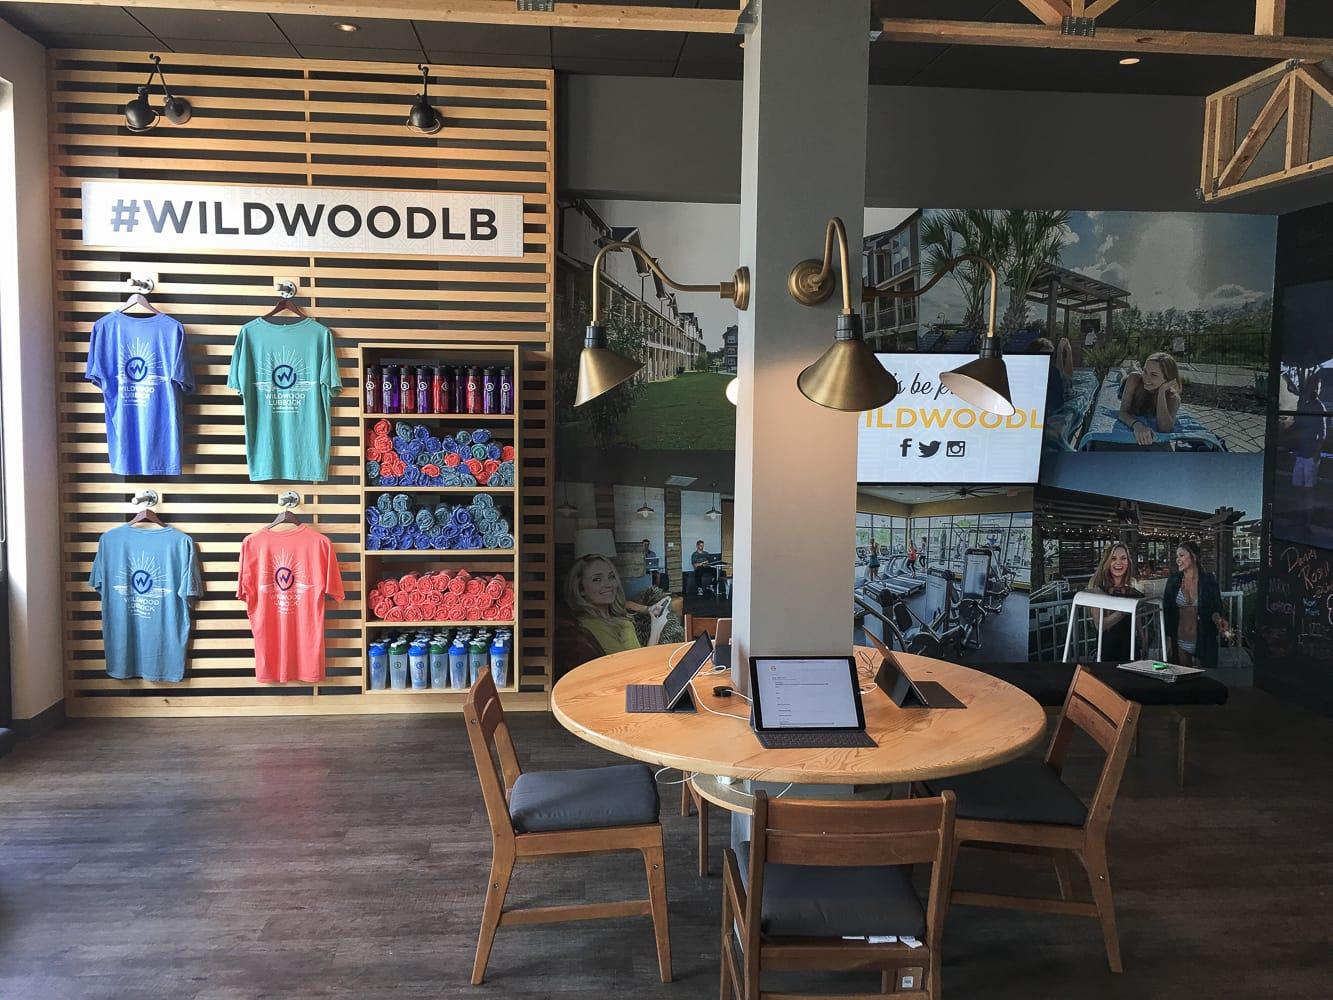 Wildwood Student Housing